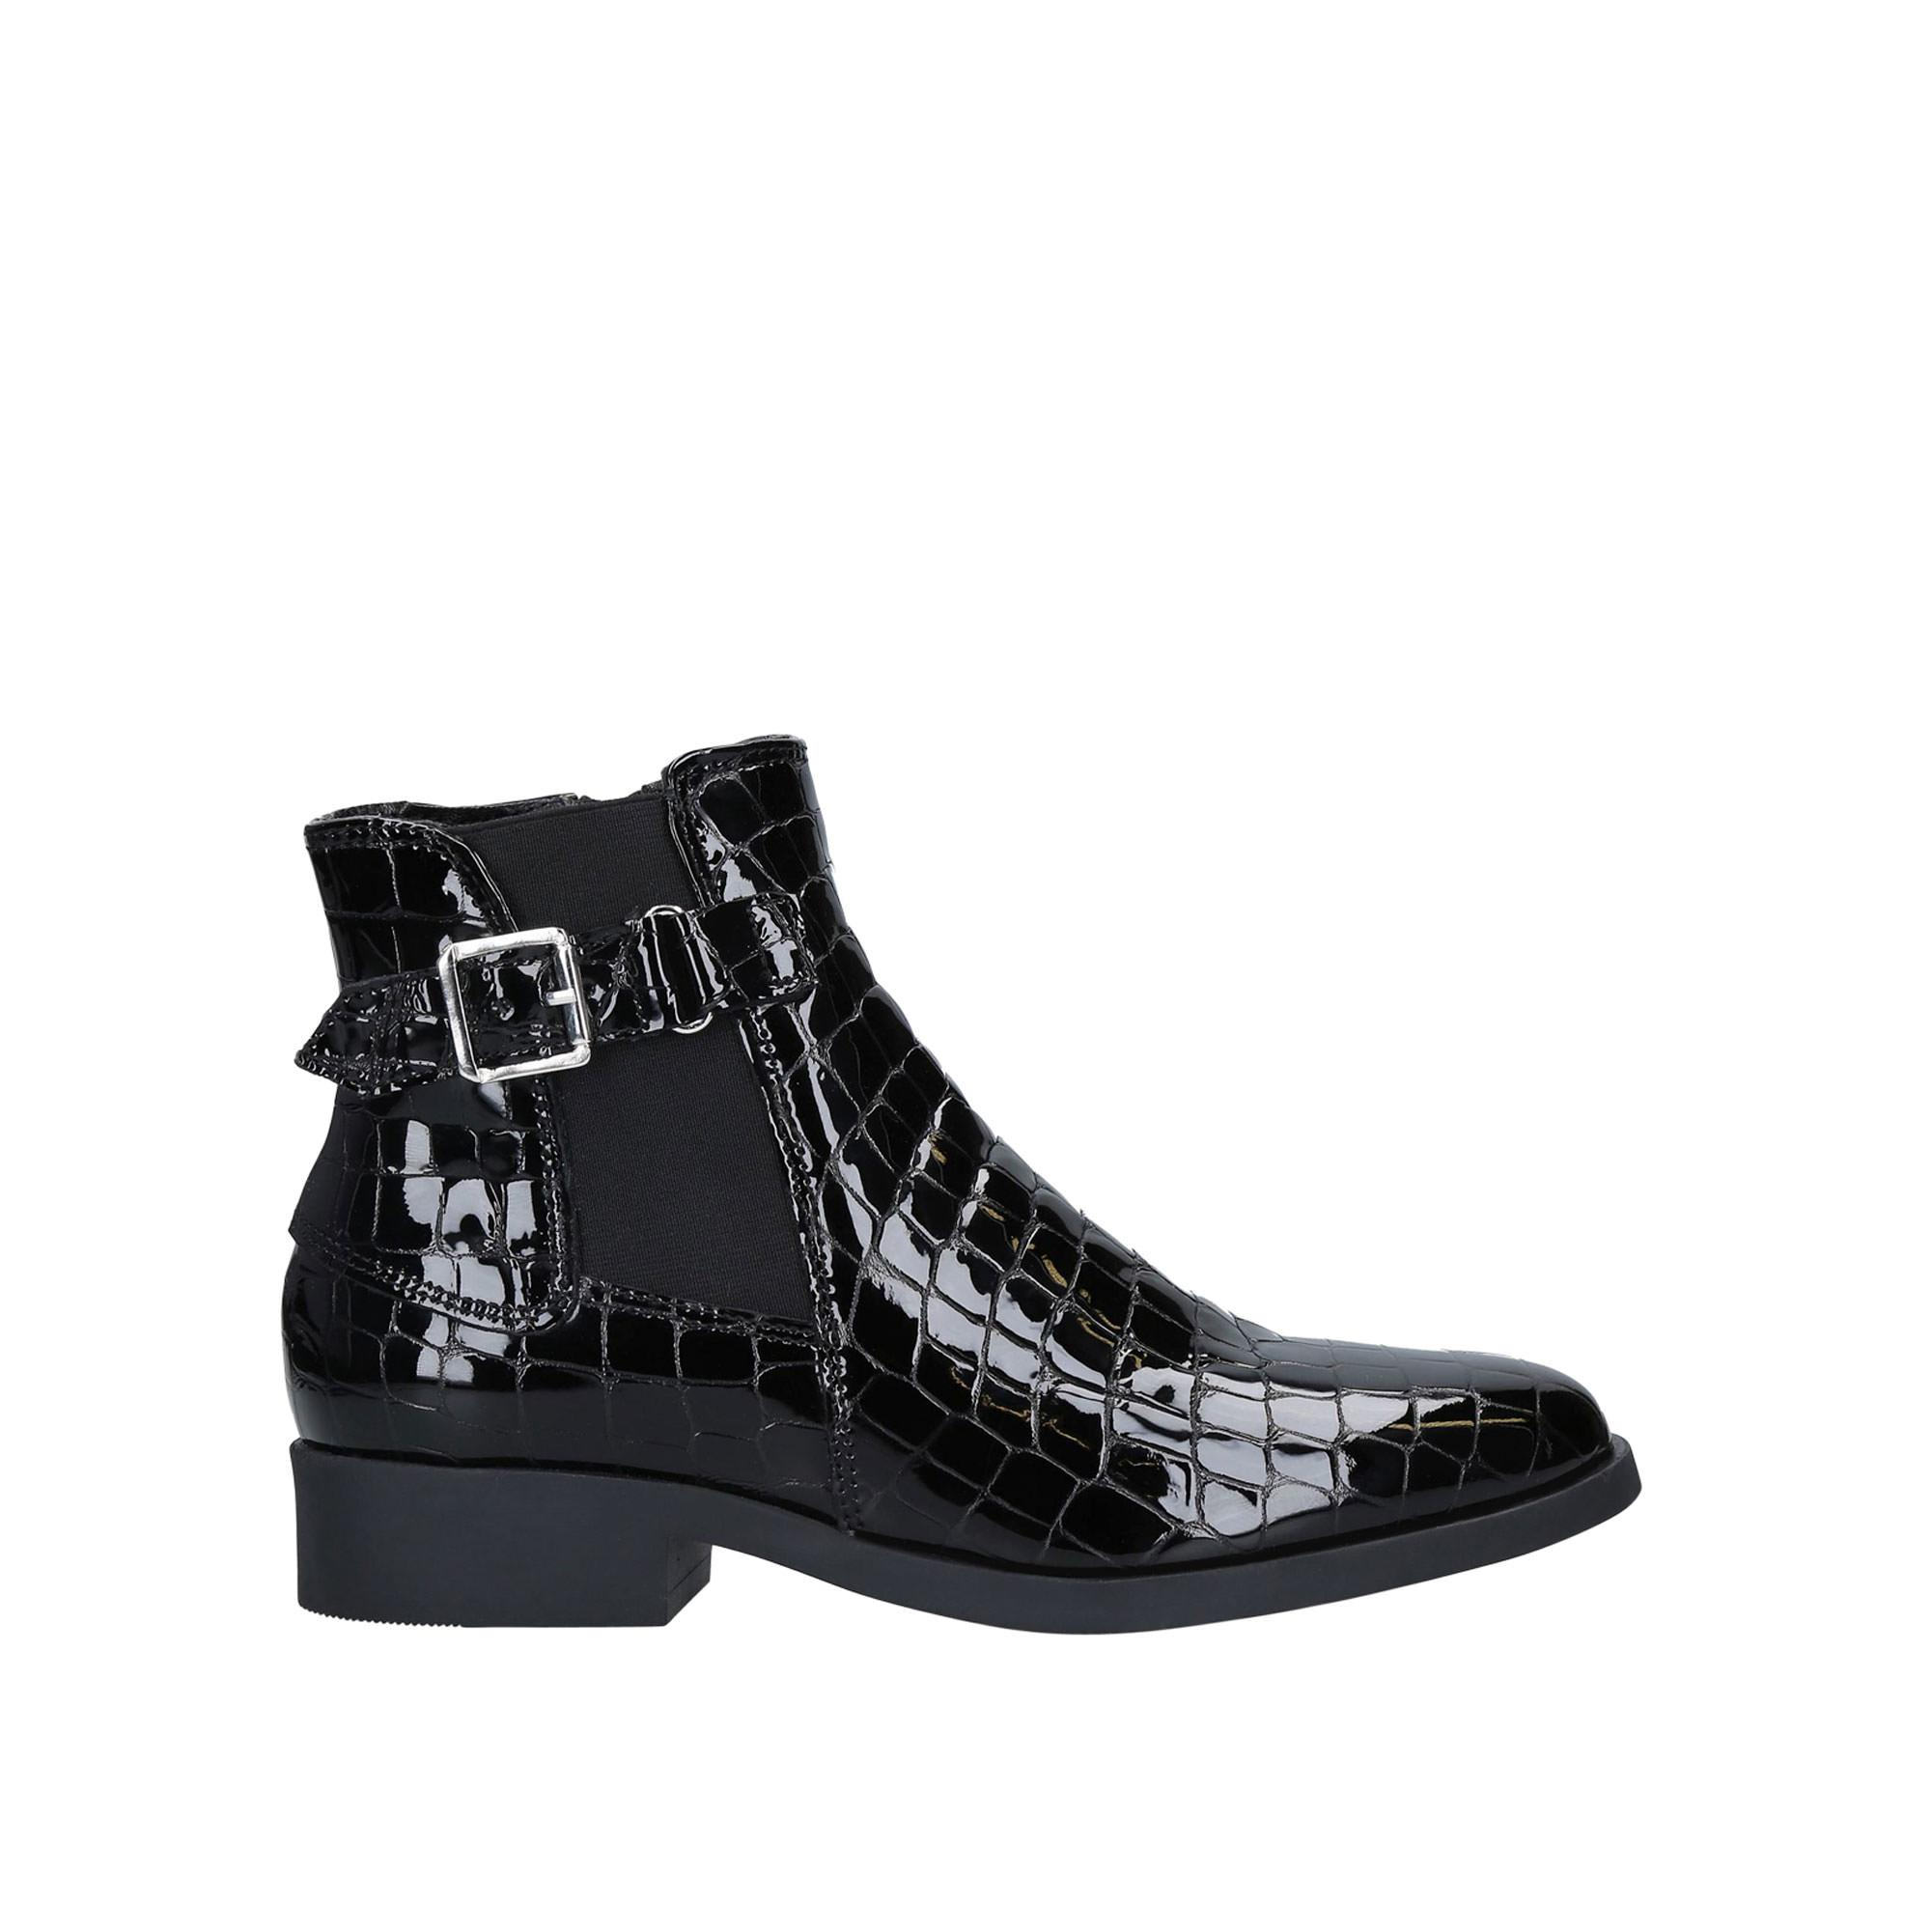 Rich Boots